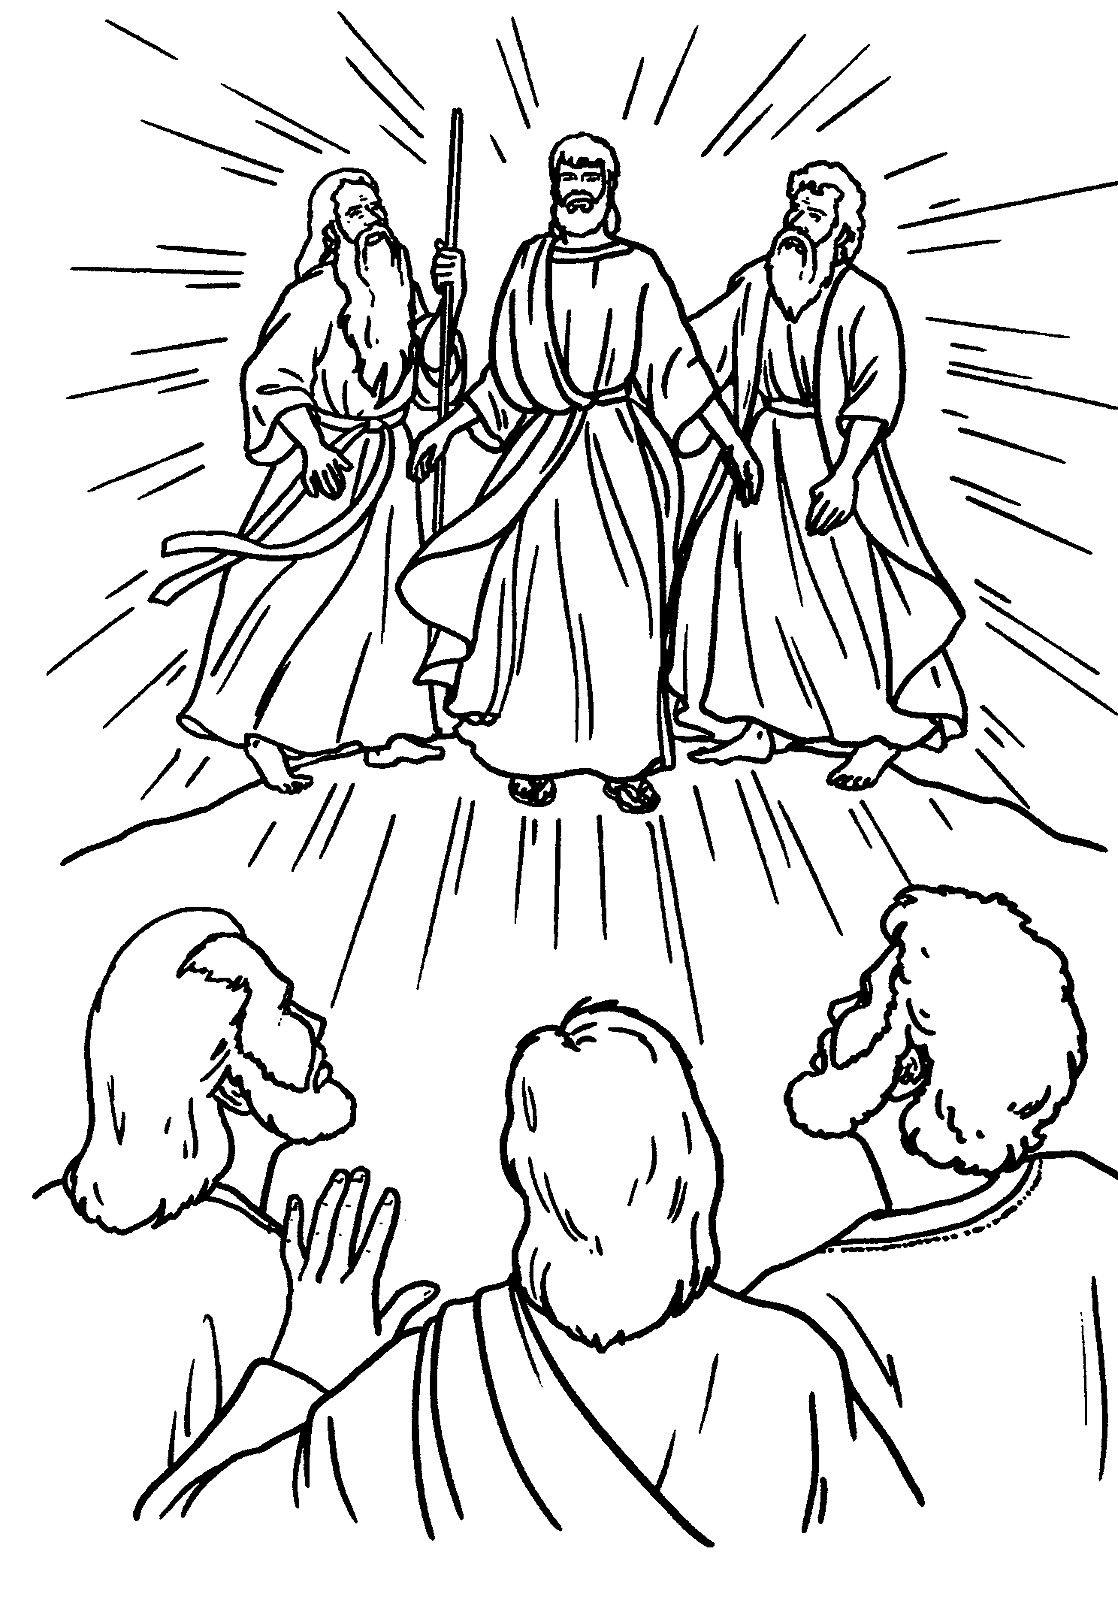 The Transfiguration Catholic Coloring Page